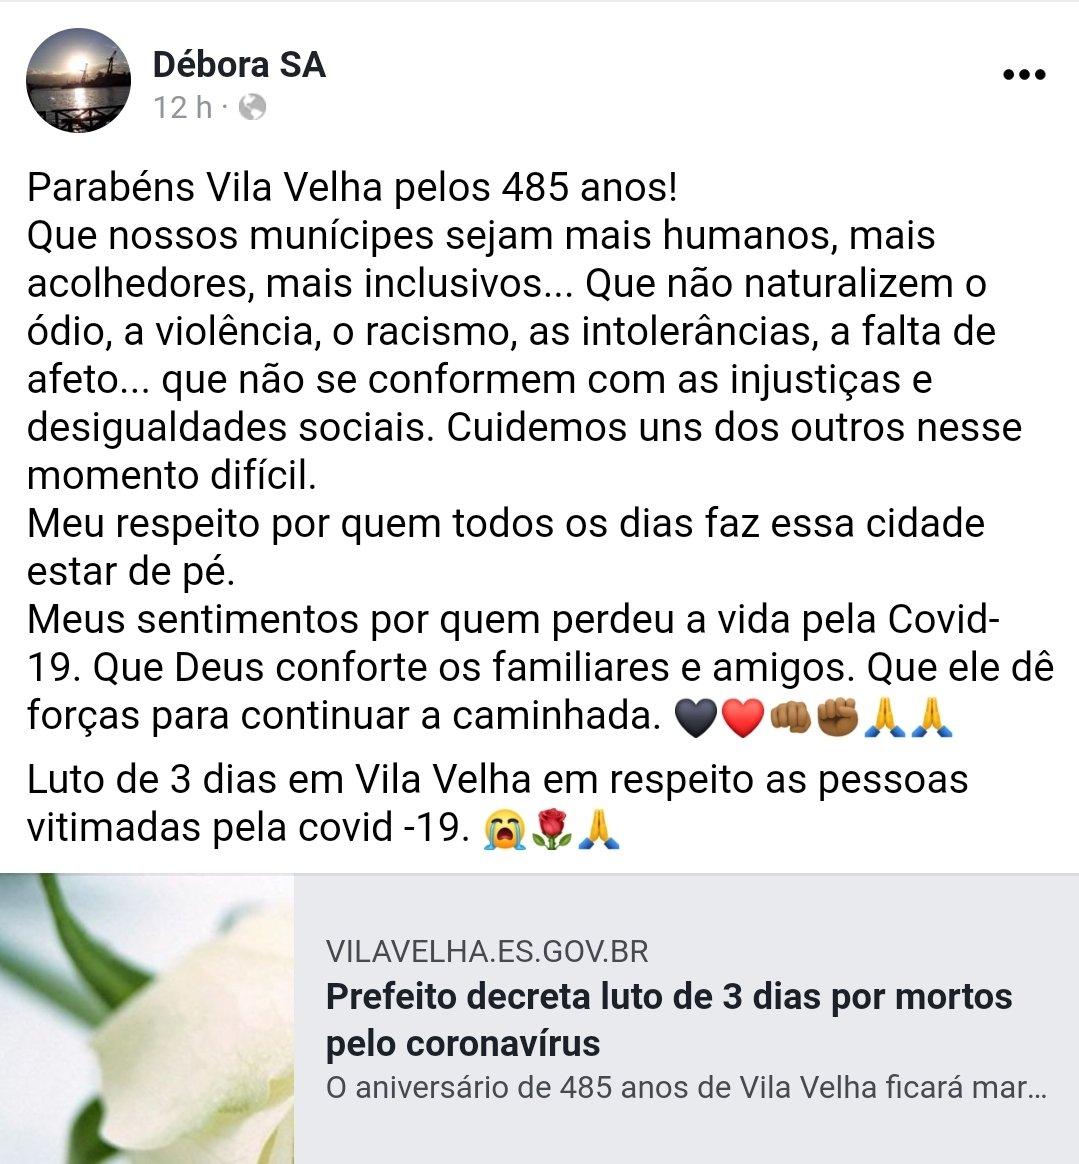 #vilavelha pic.twitter.com/puSnFaNUhB